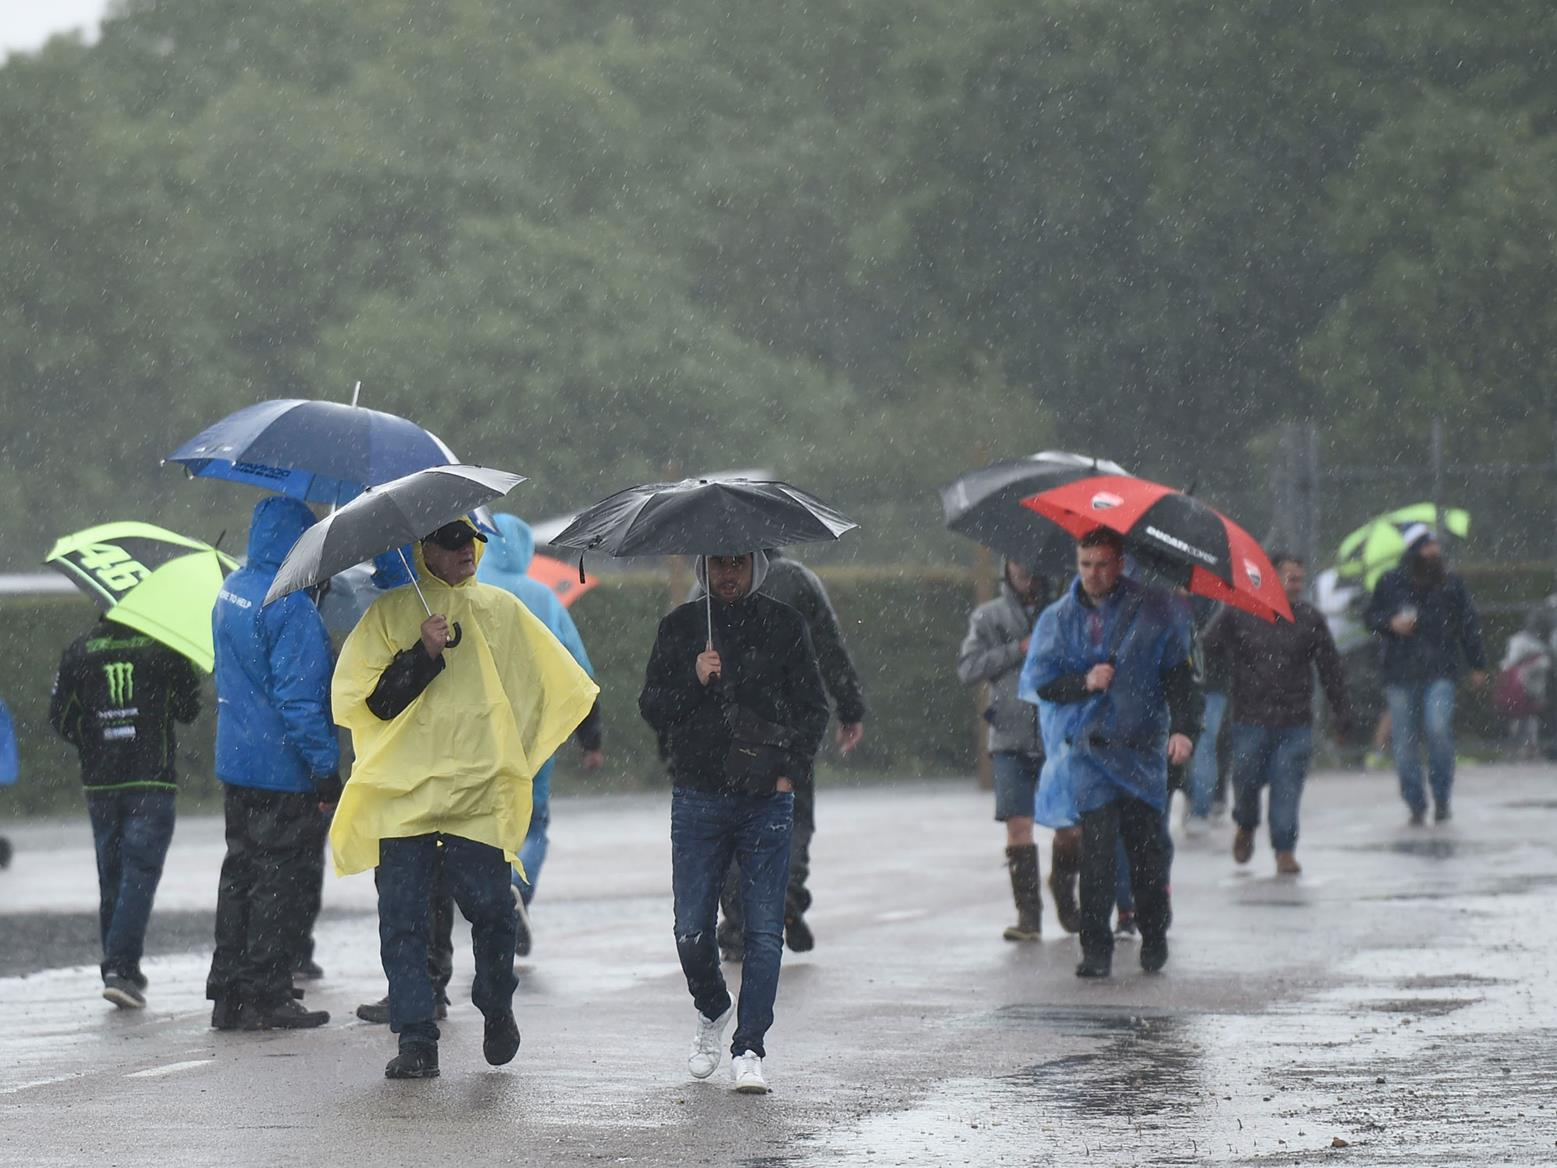 The rain shouldn't stop play at the 2019 British MotoGP at Silverstone